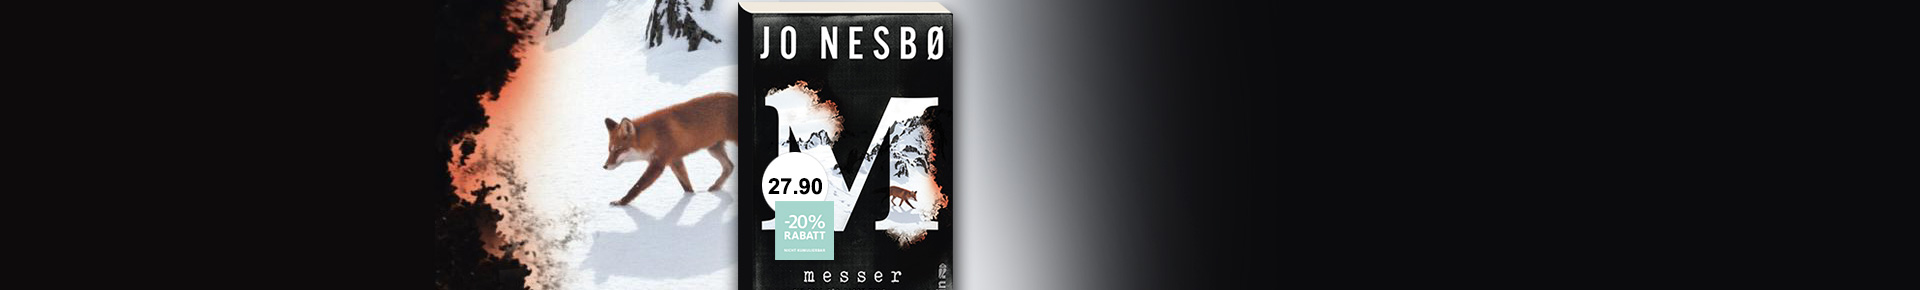 Messer - Jo Nesbø